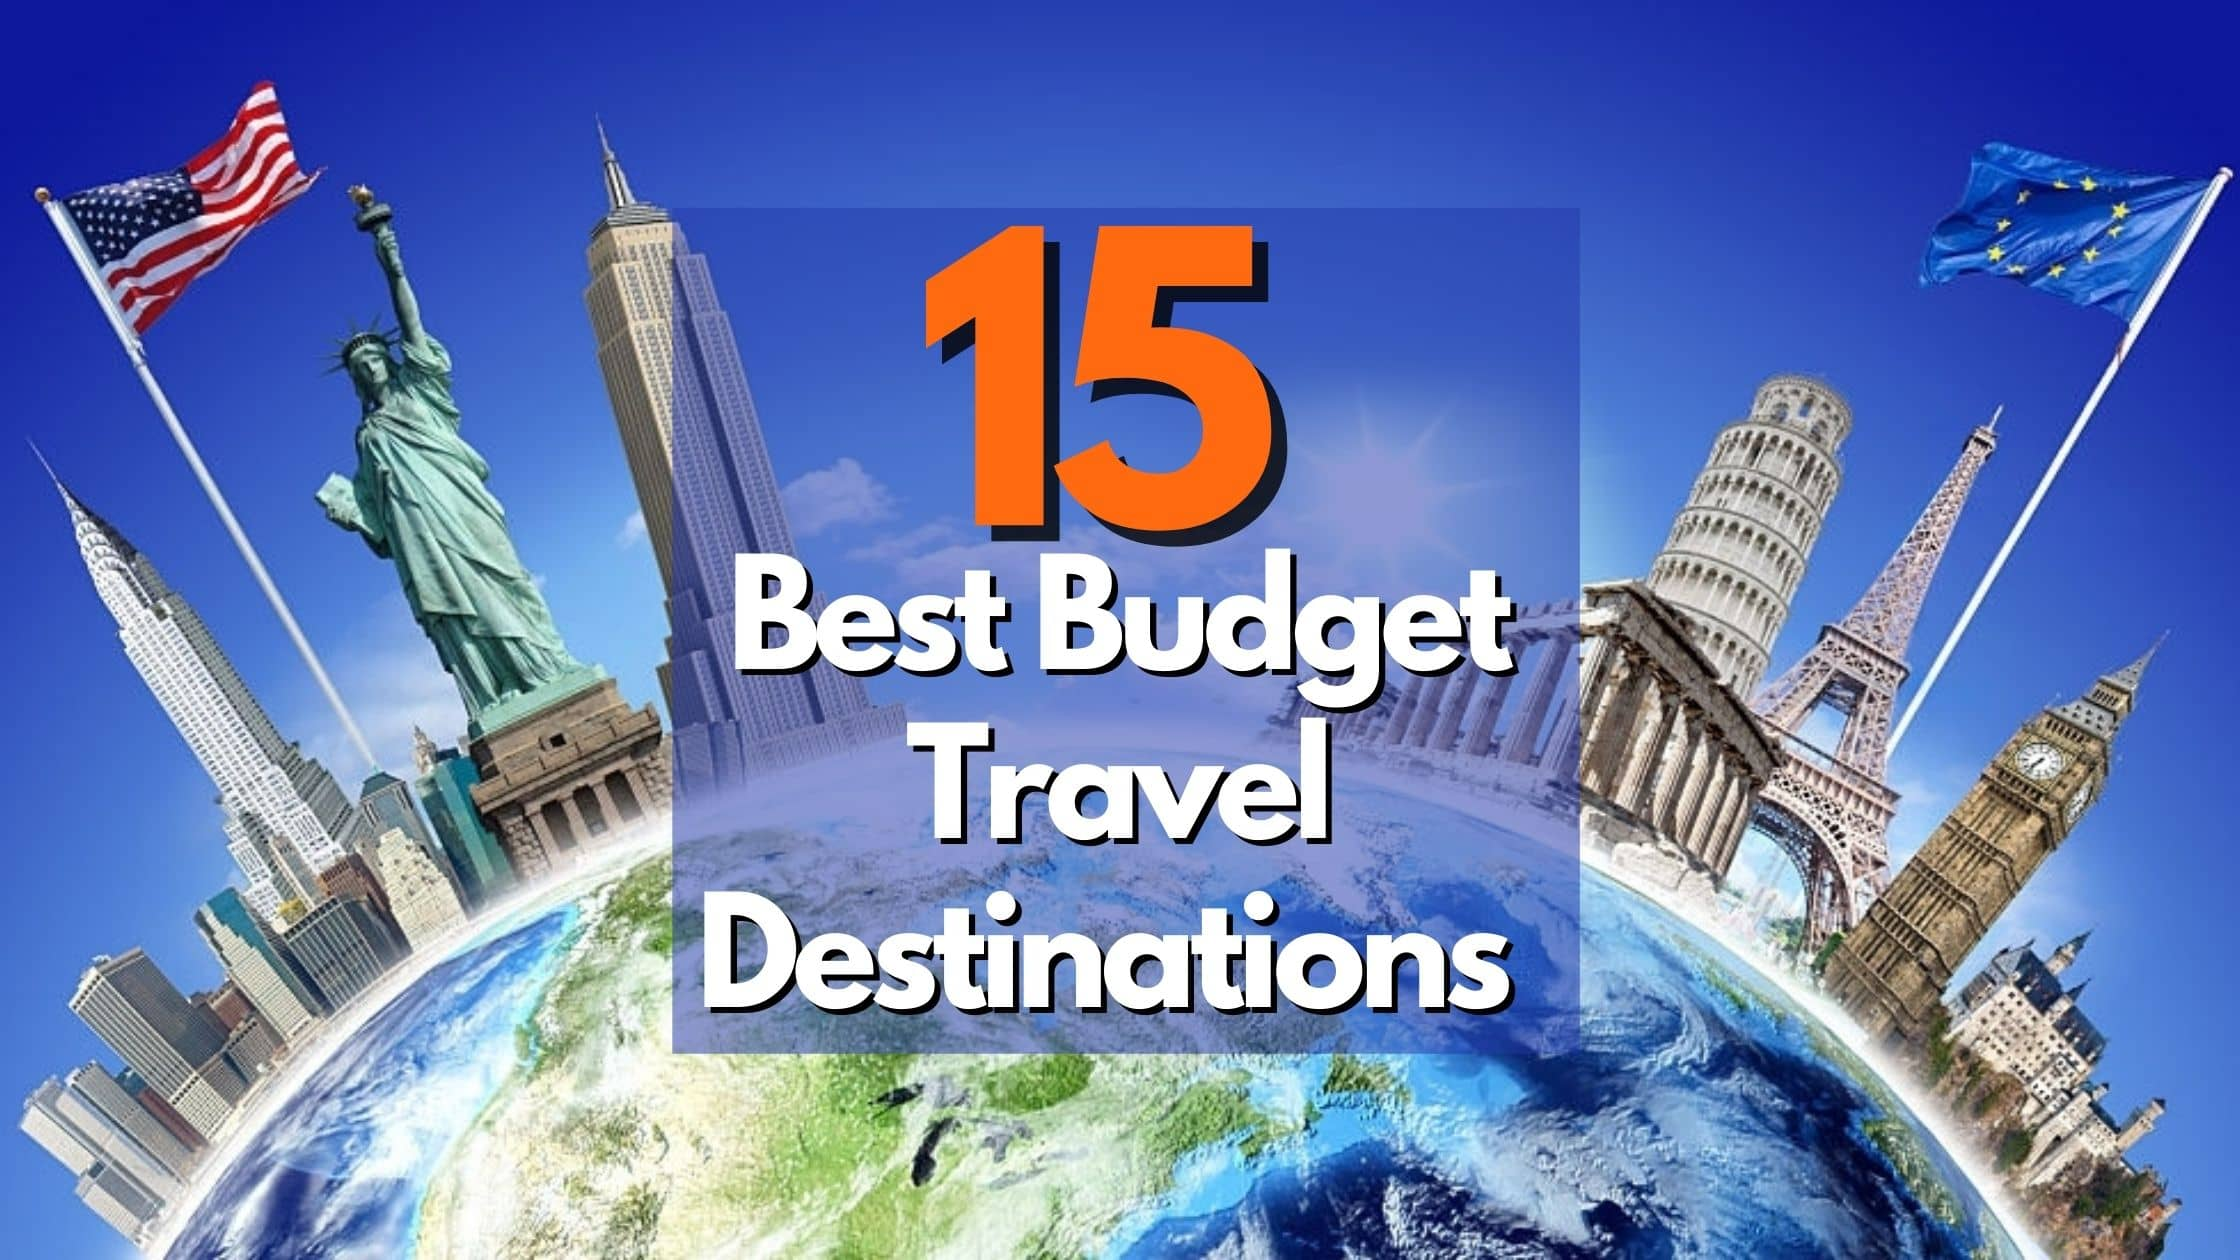 Best Budget Travel Destinations 2021